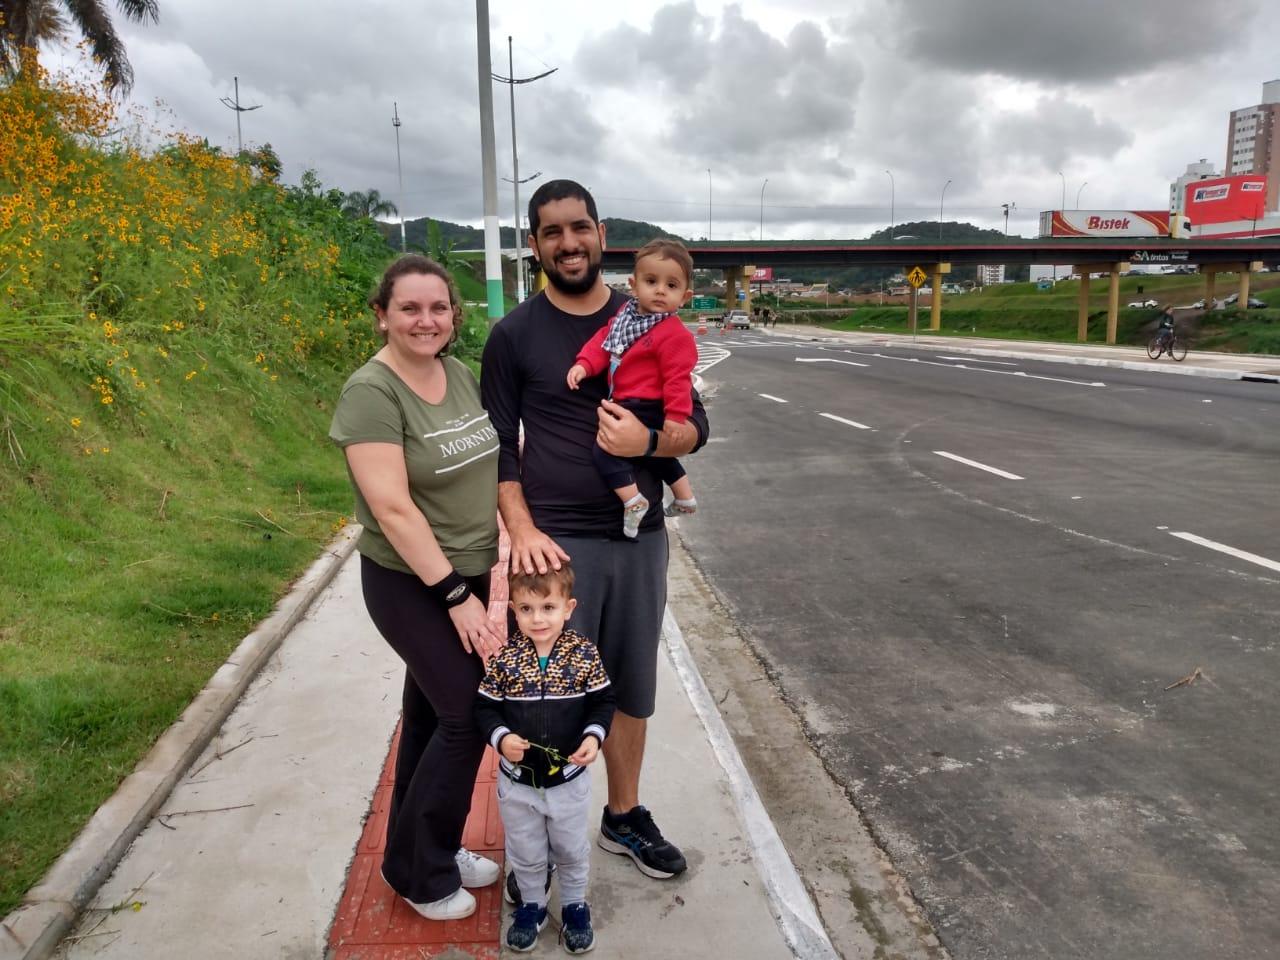 Famílias de Brusque aproveitam domingo (10) na Avenida Governador Luiz Henrique da Silveira